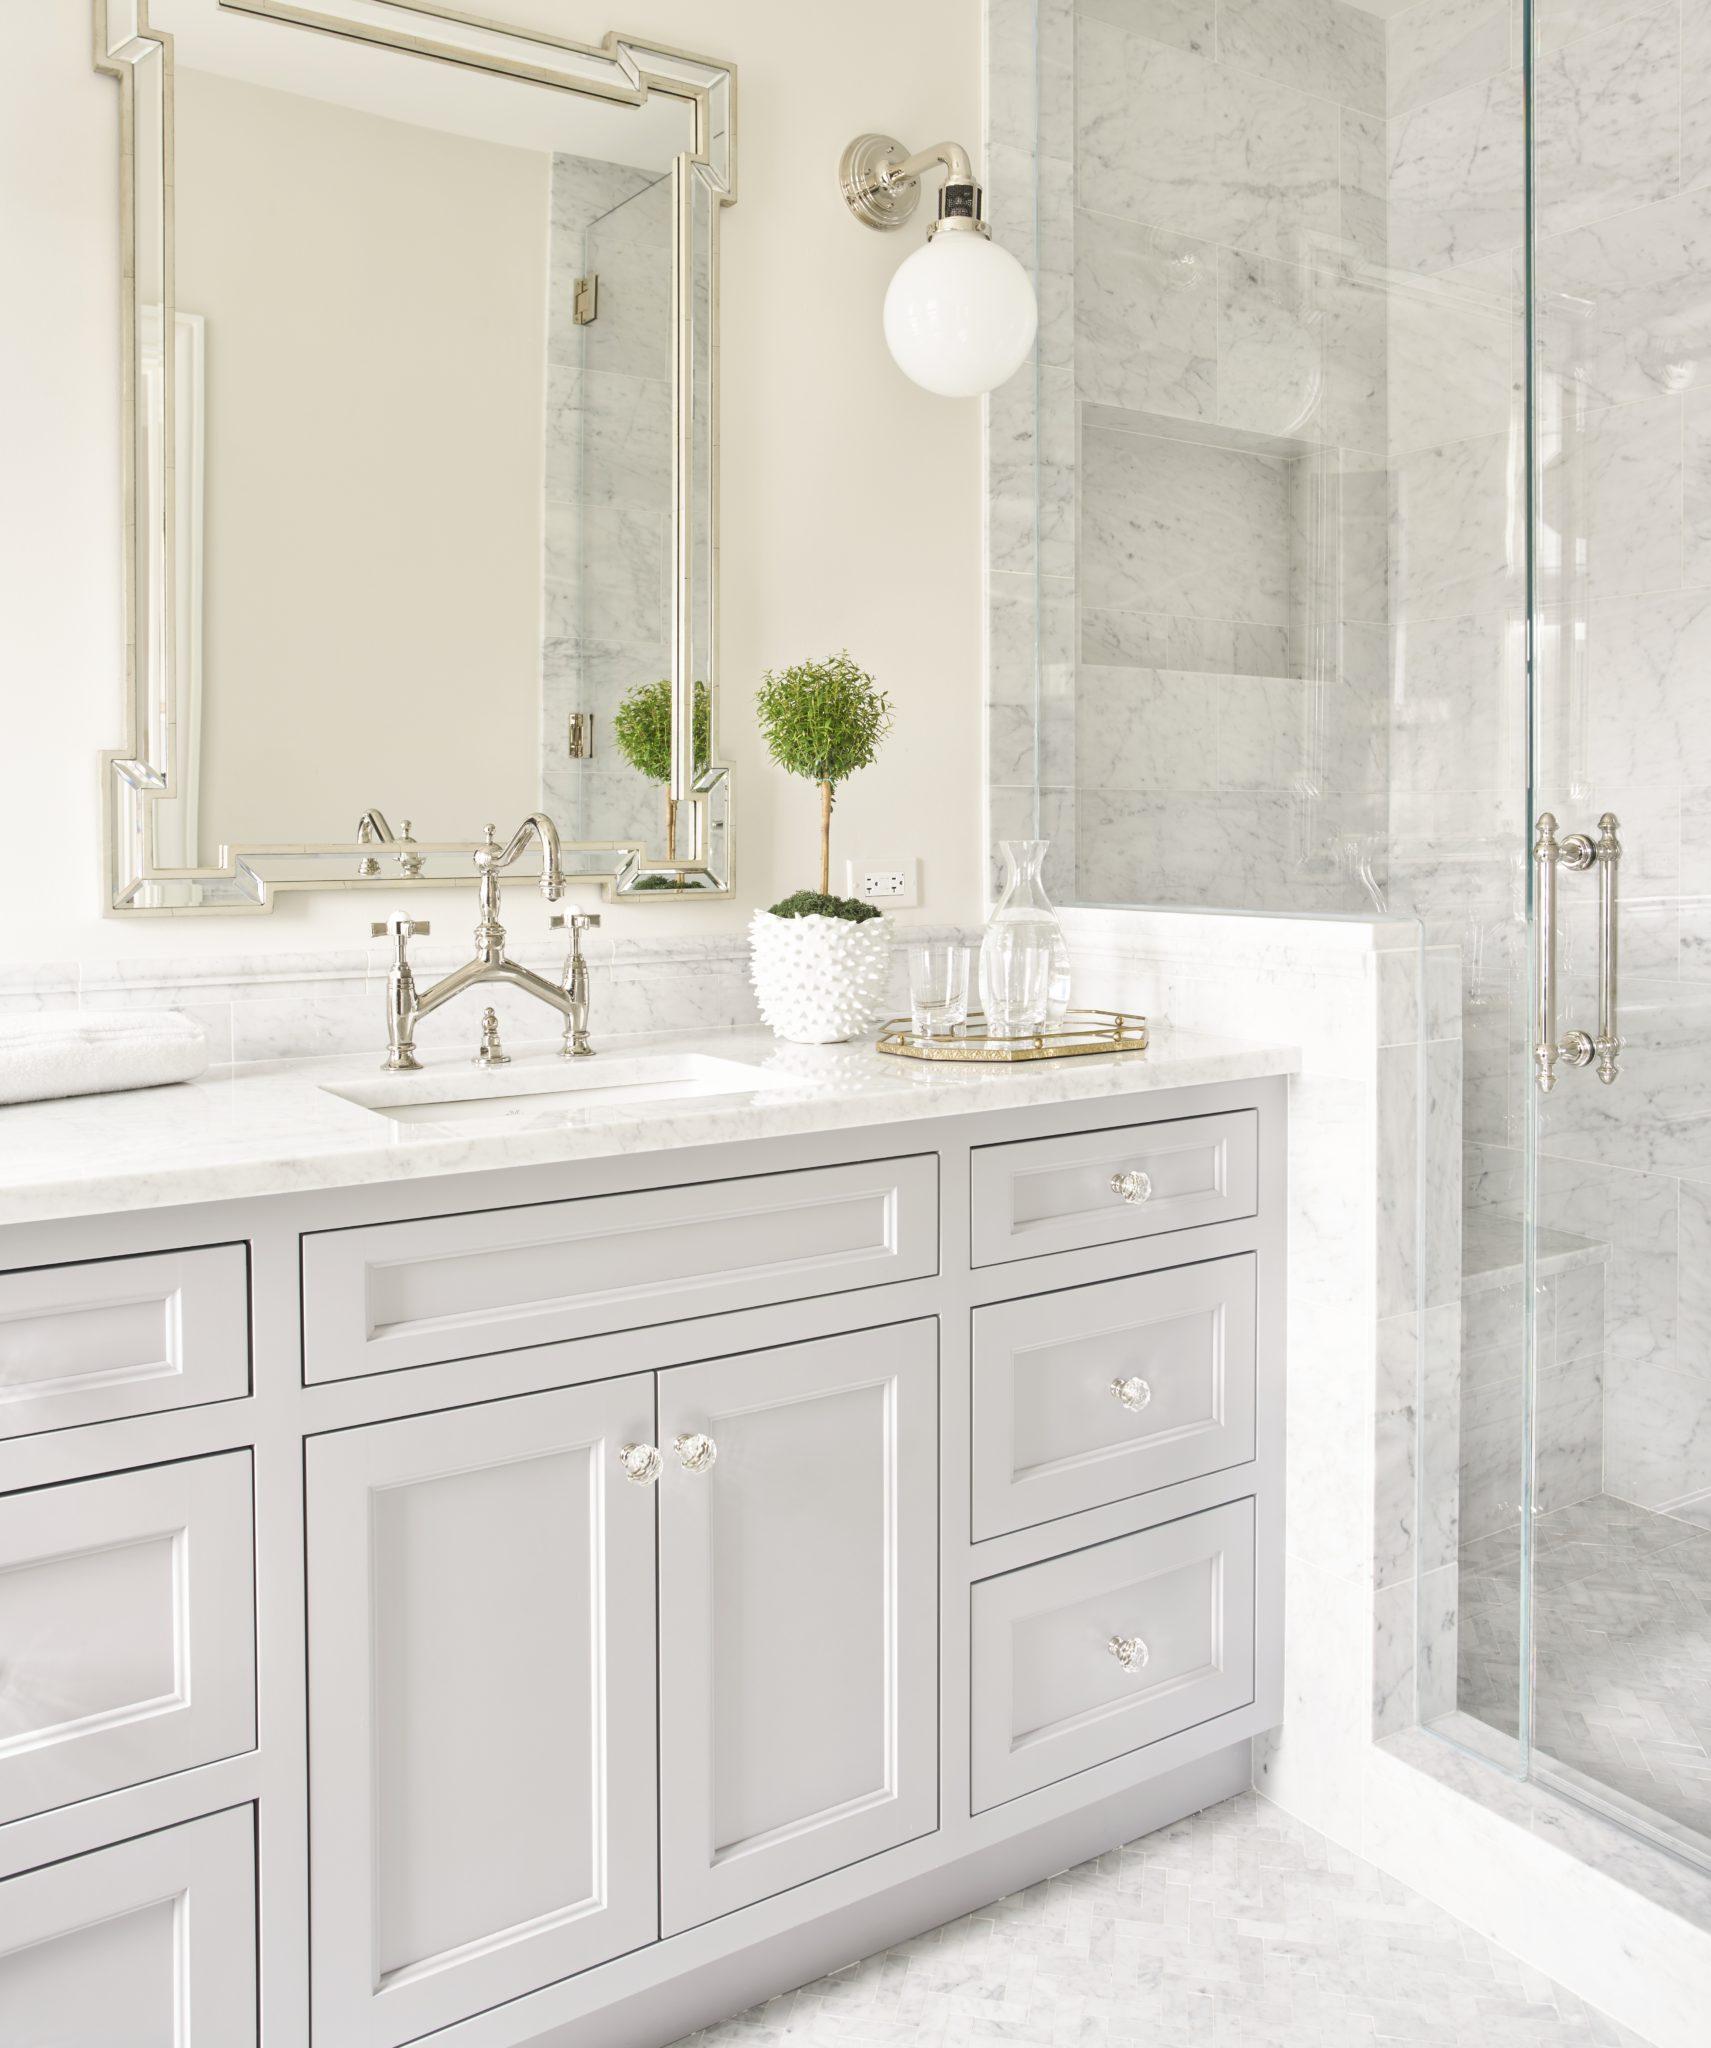 Lincoln Park Co-op Bathroom by Kim Scodro Interiors